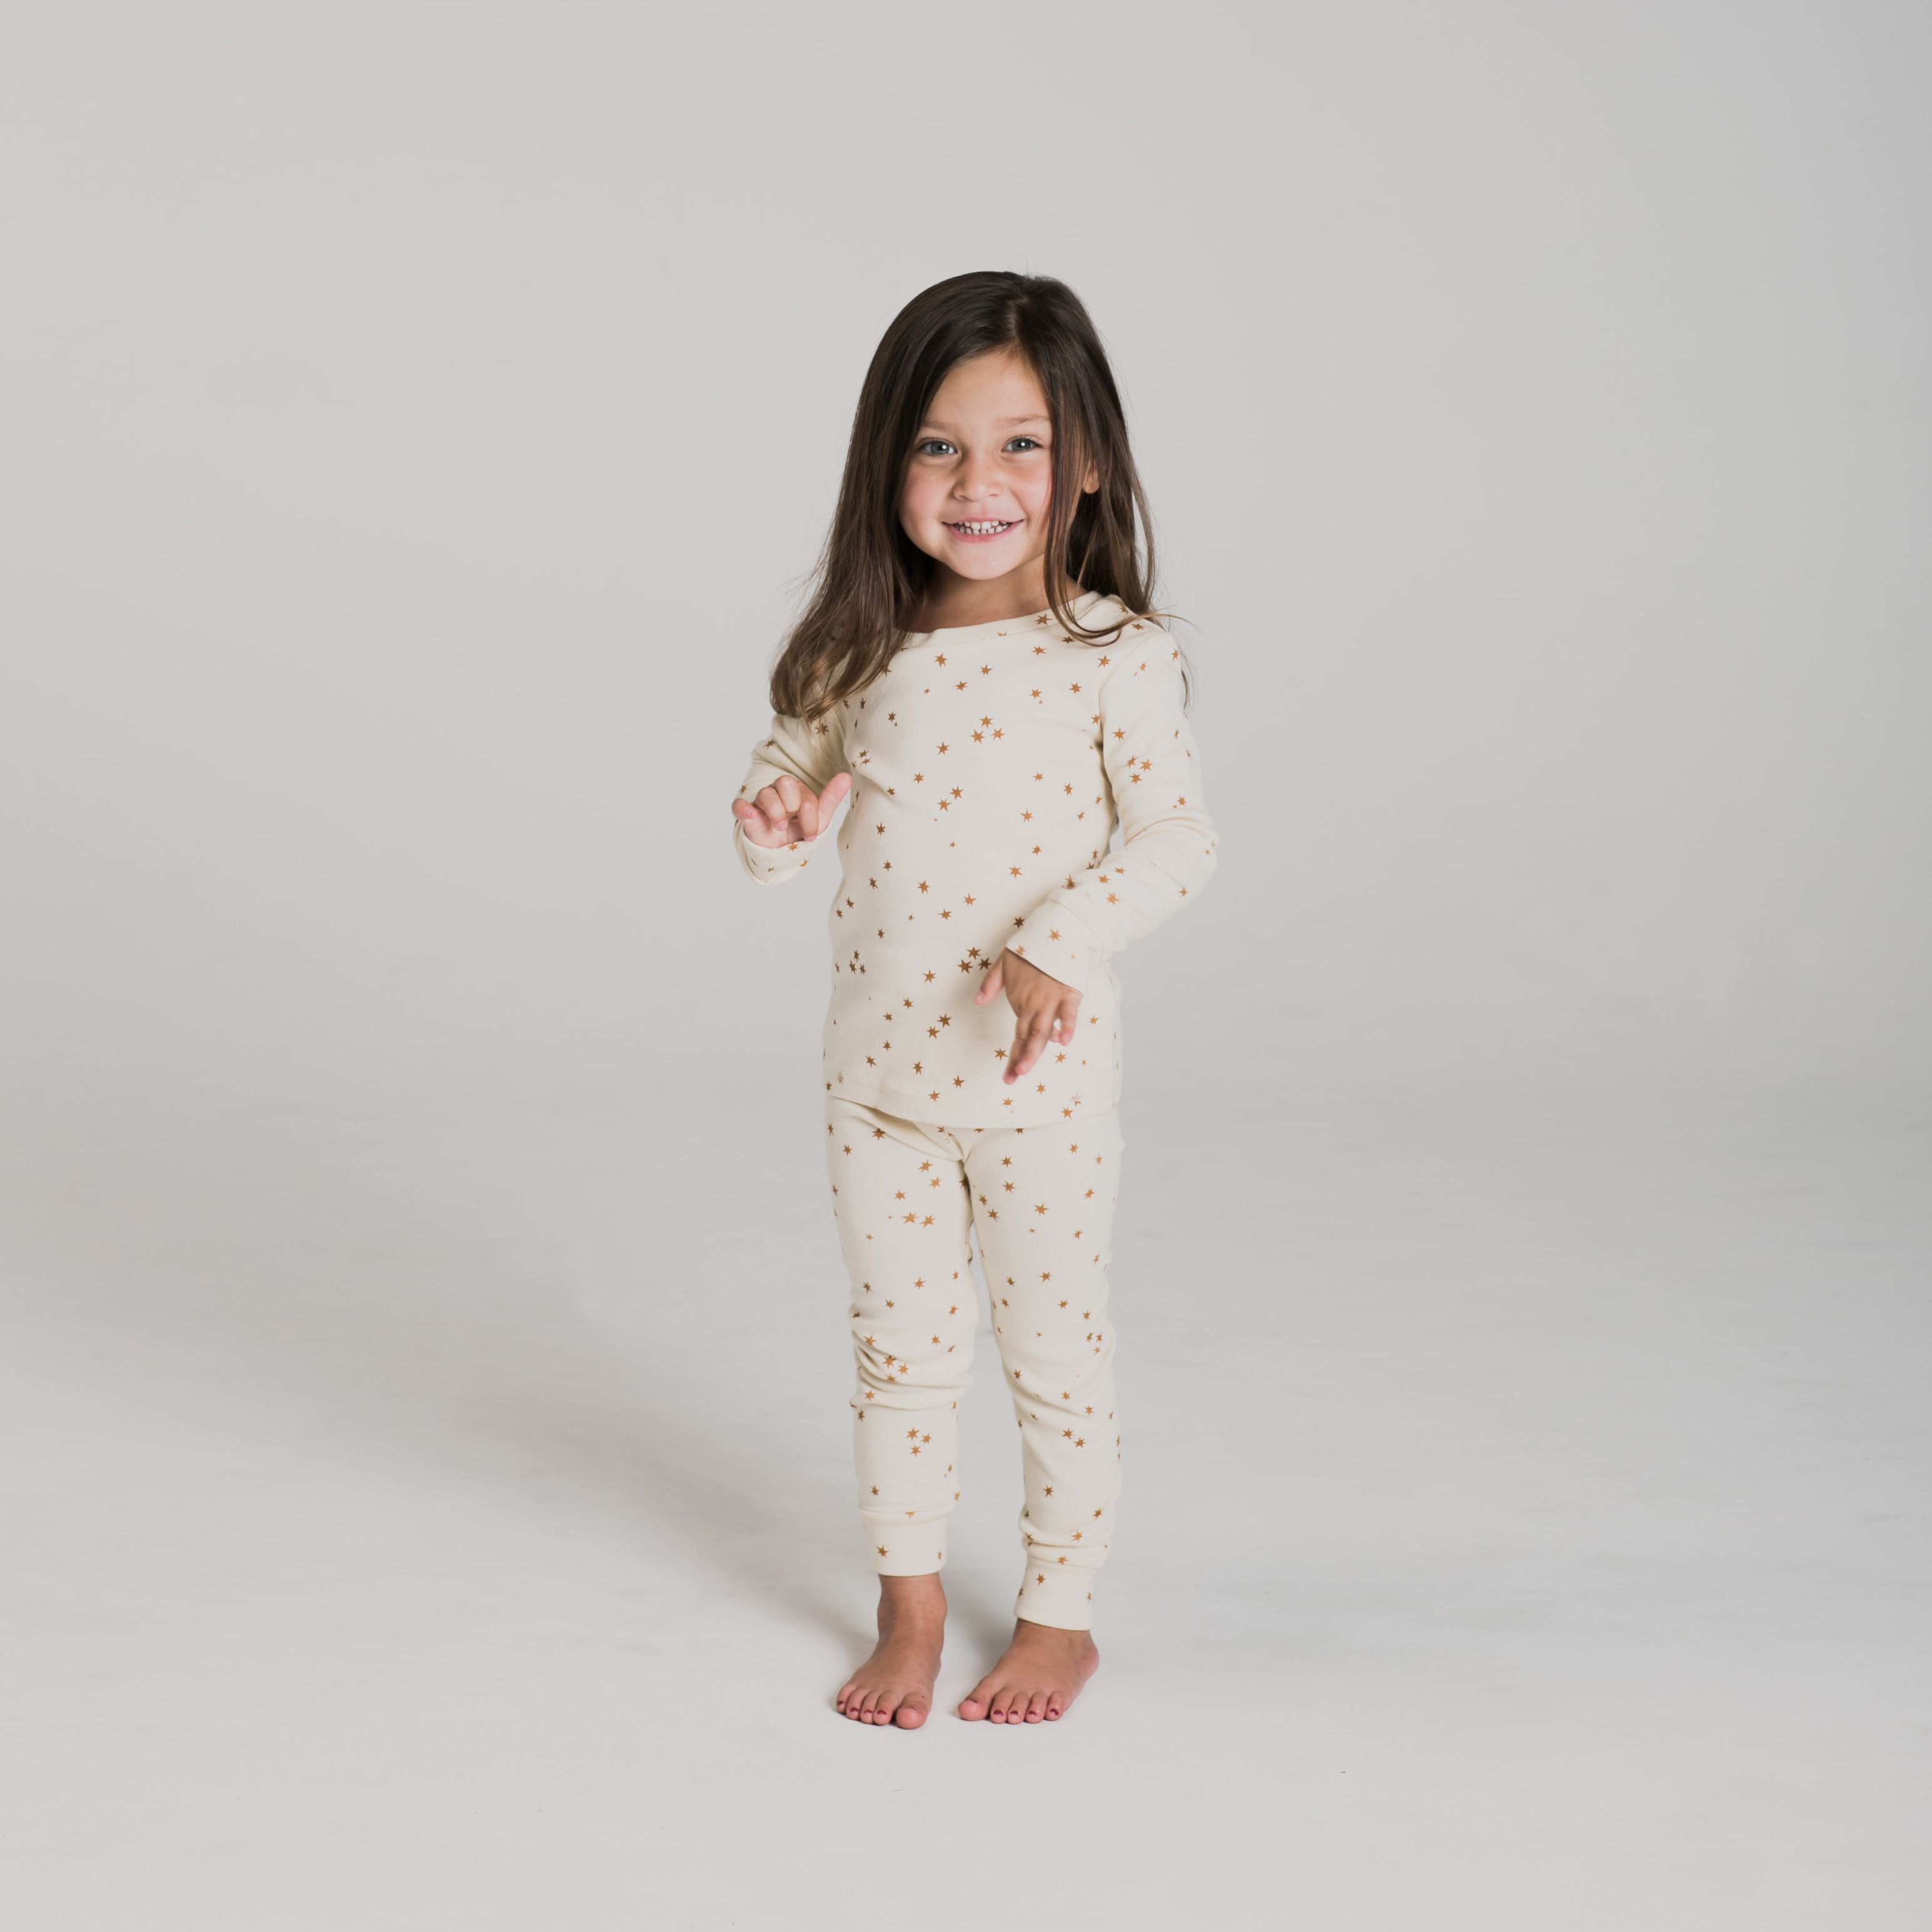 a479add49723 Rylee + Cru Girl Pajama